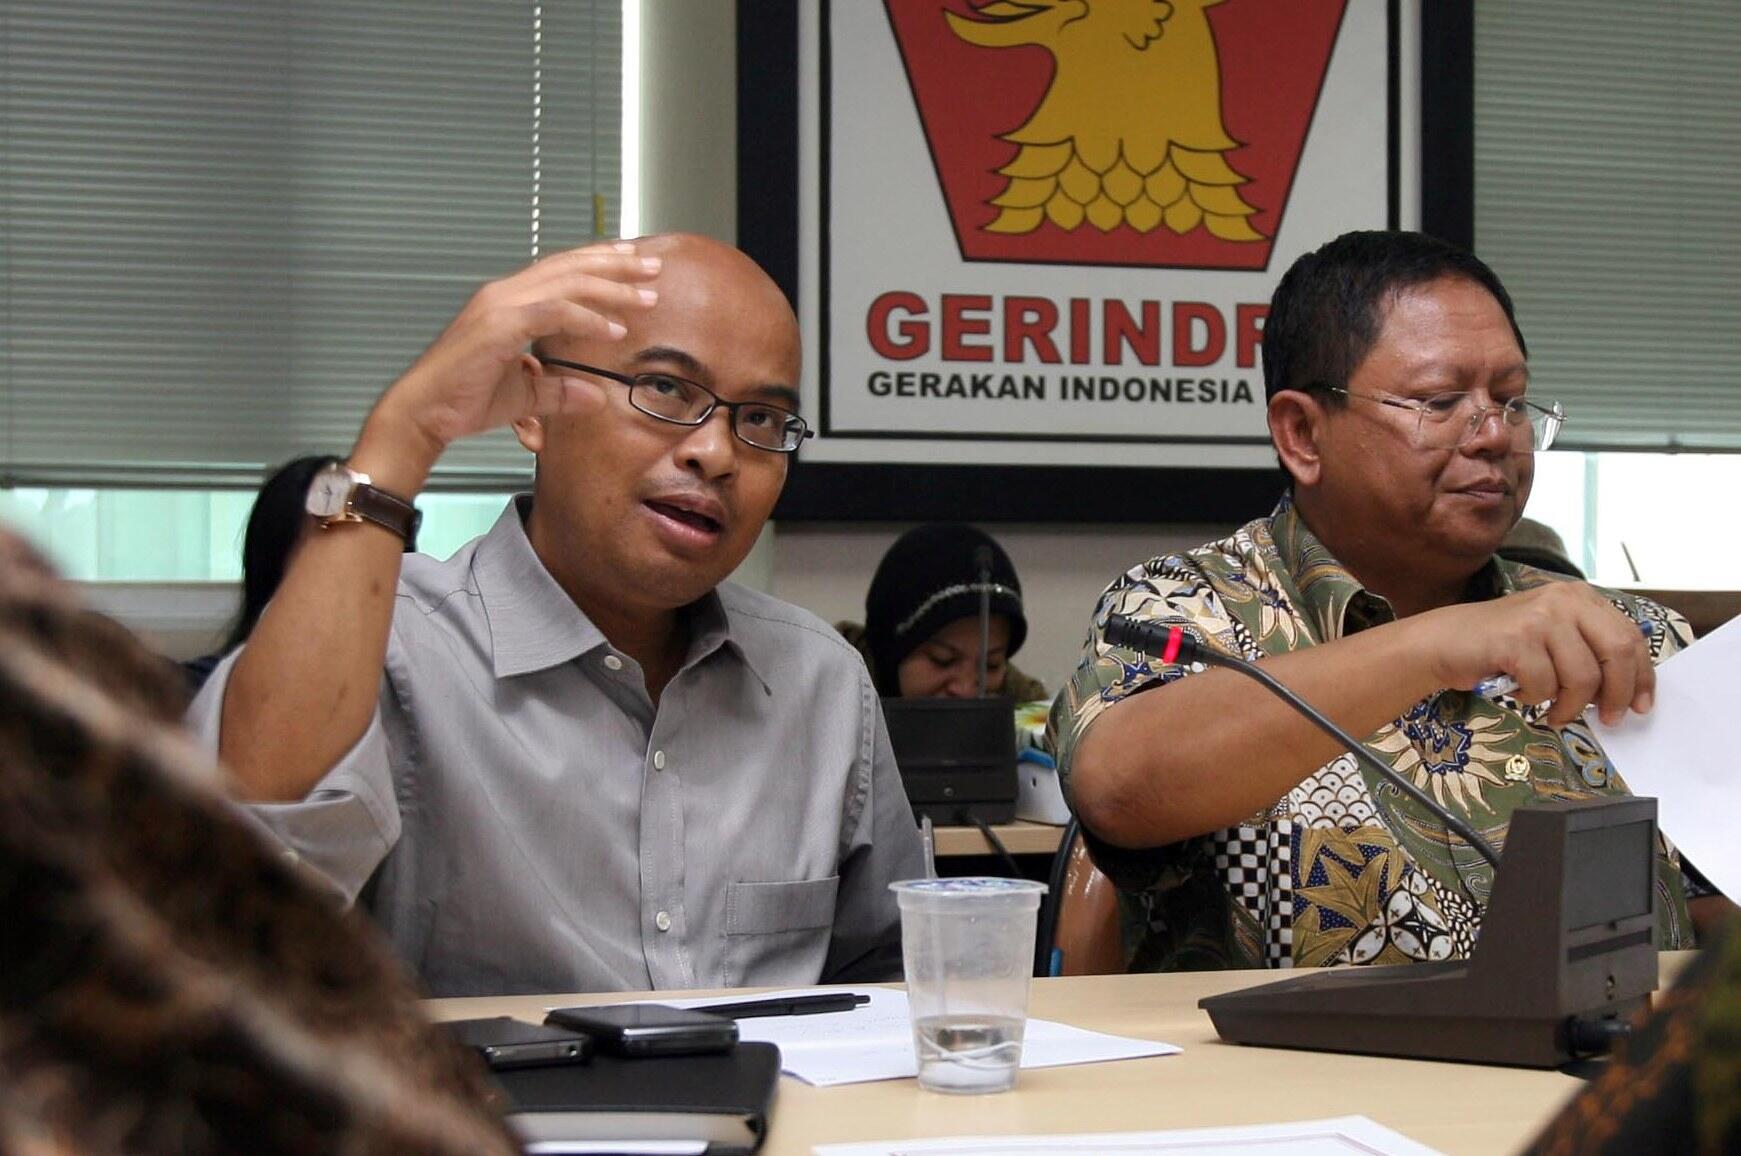 Gerindra Cemas Prabowo tak Jadi Nyapres